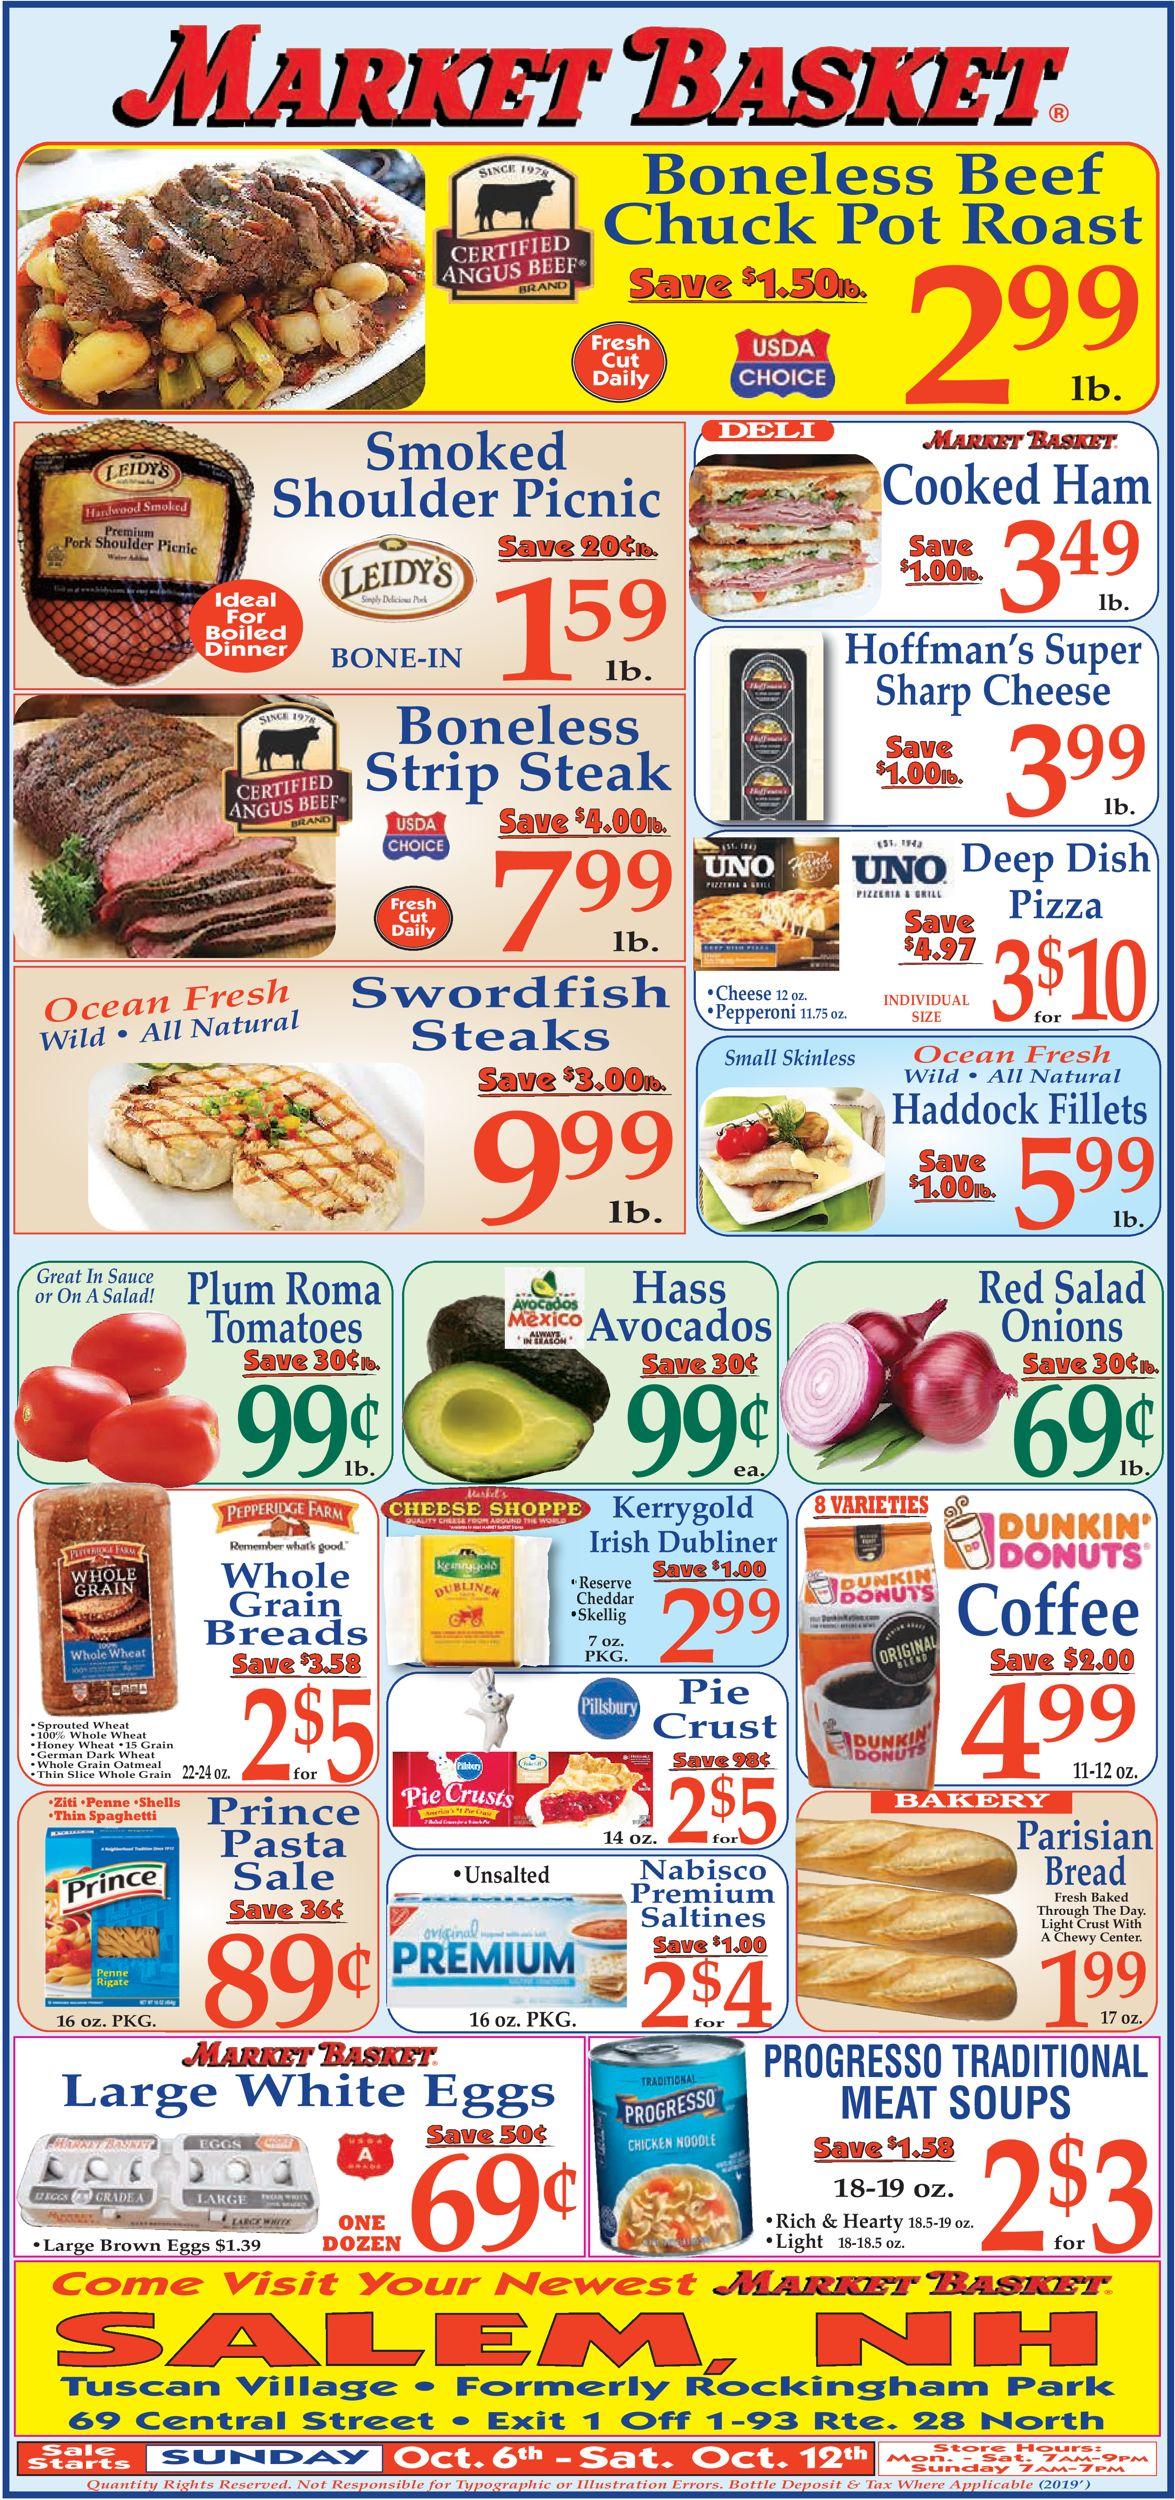 Market Basket Bakery Christmas 2020 Market Basket Current weekly ad 10/06   10/12/2019   frequent ads.com